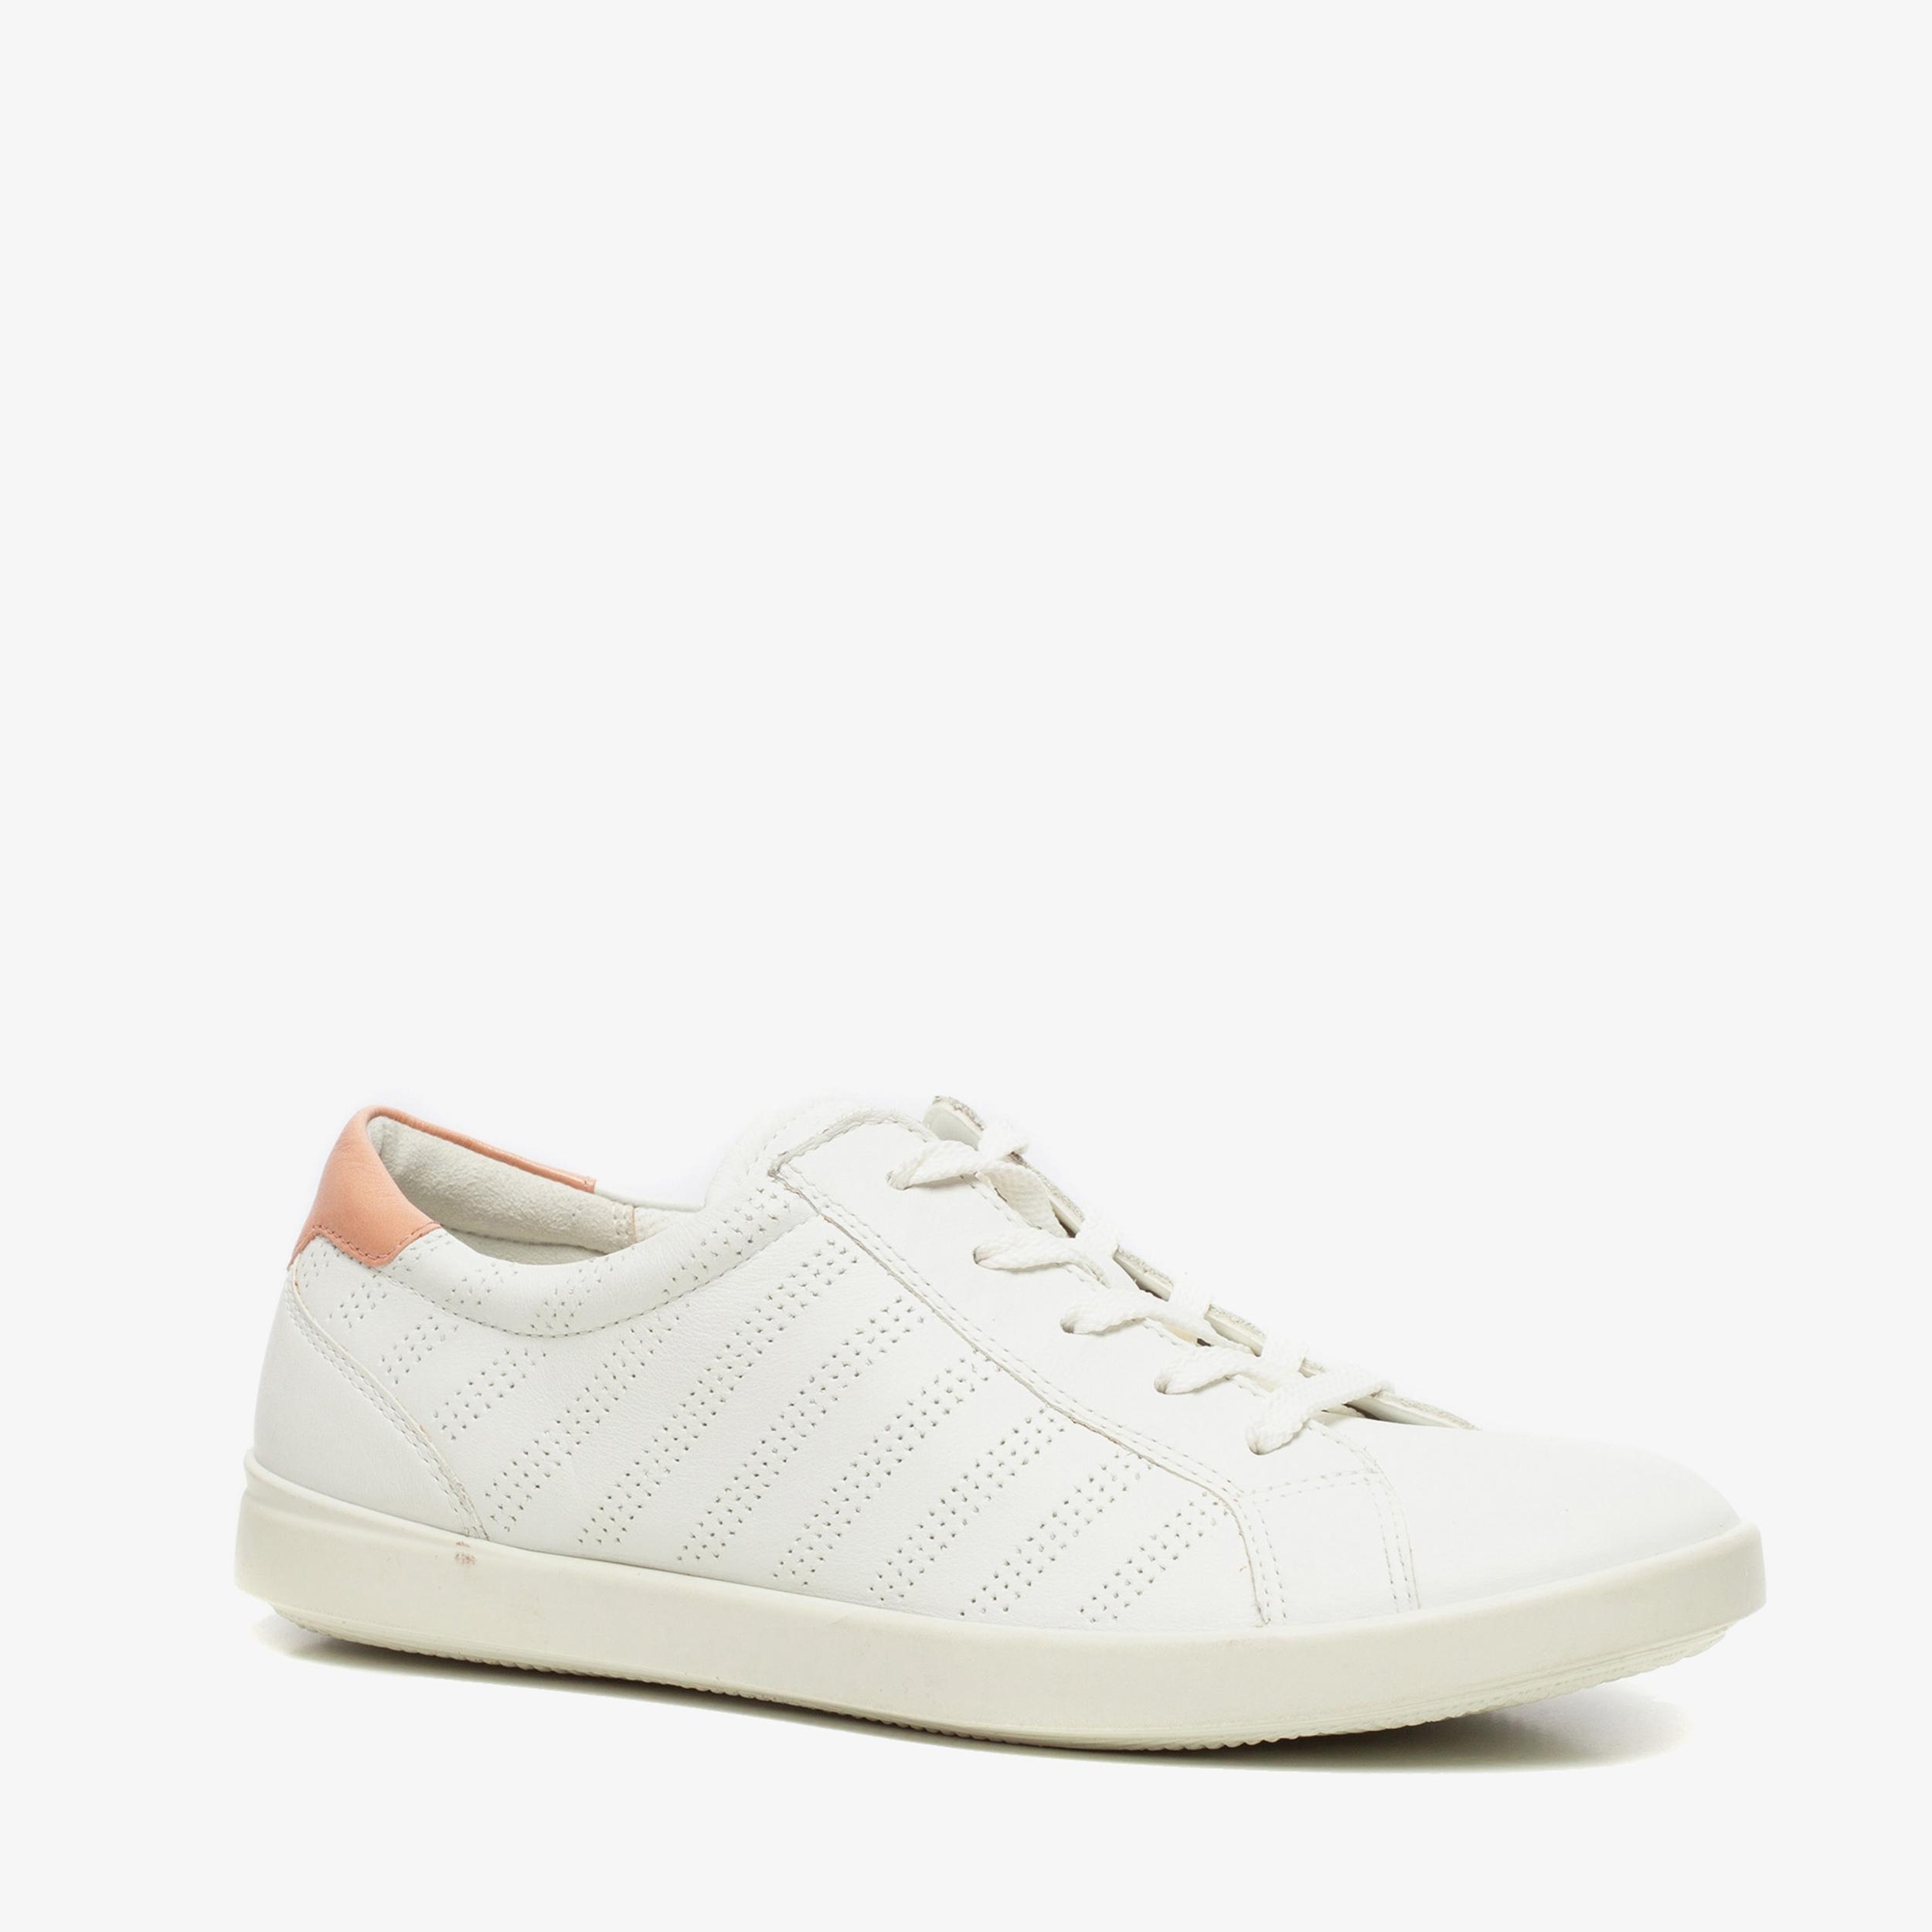 ECCO Leisure dames sneakers